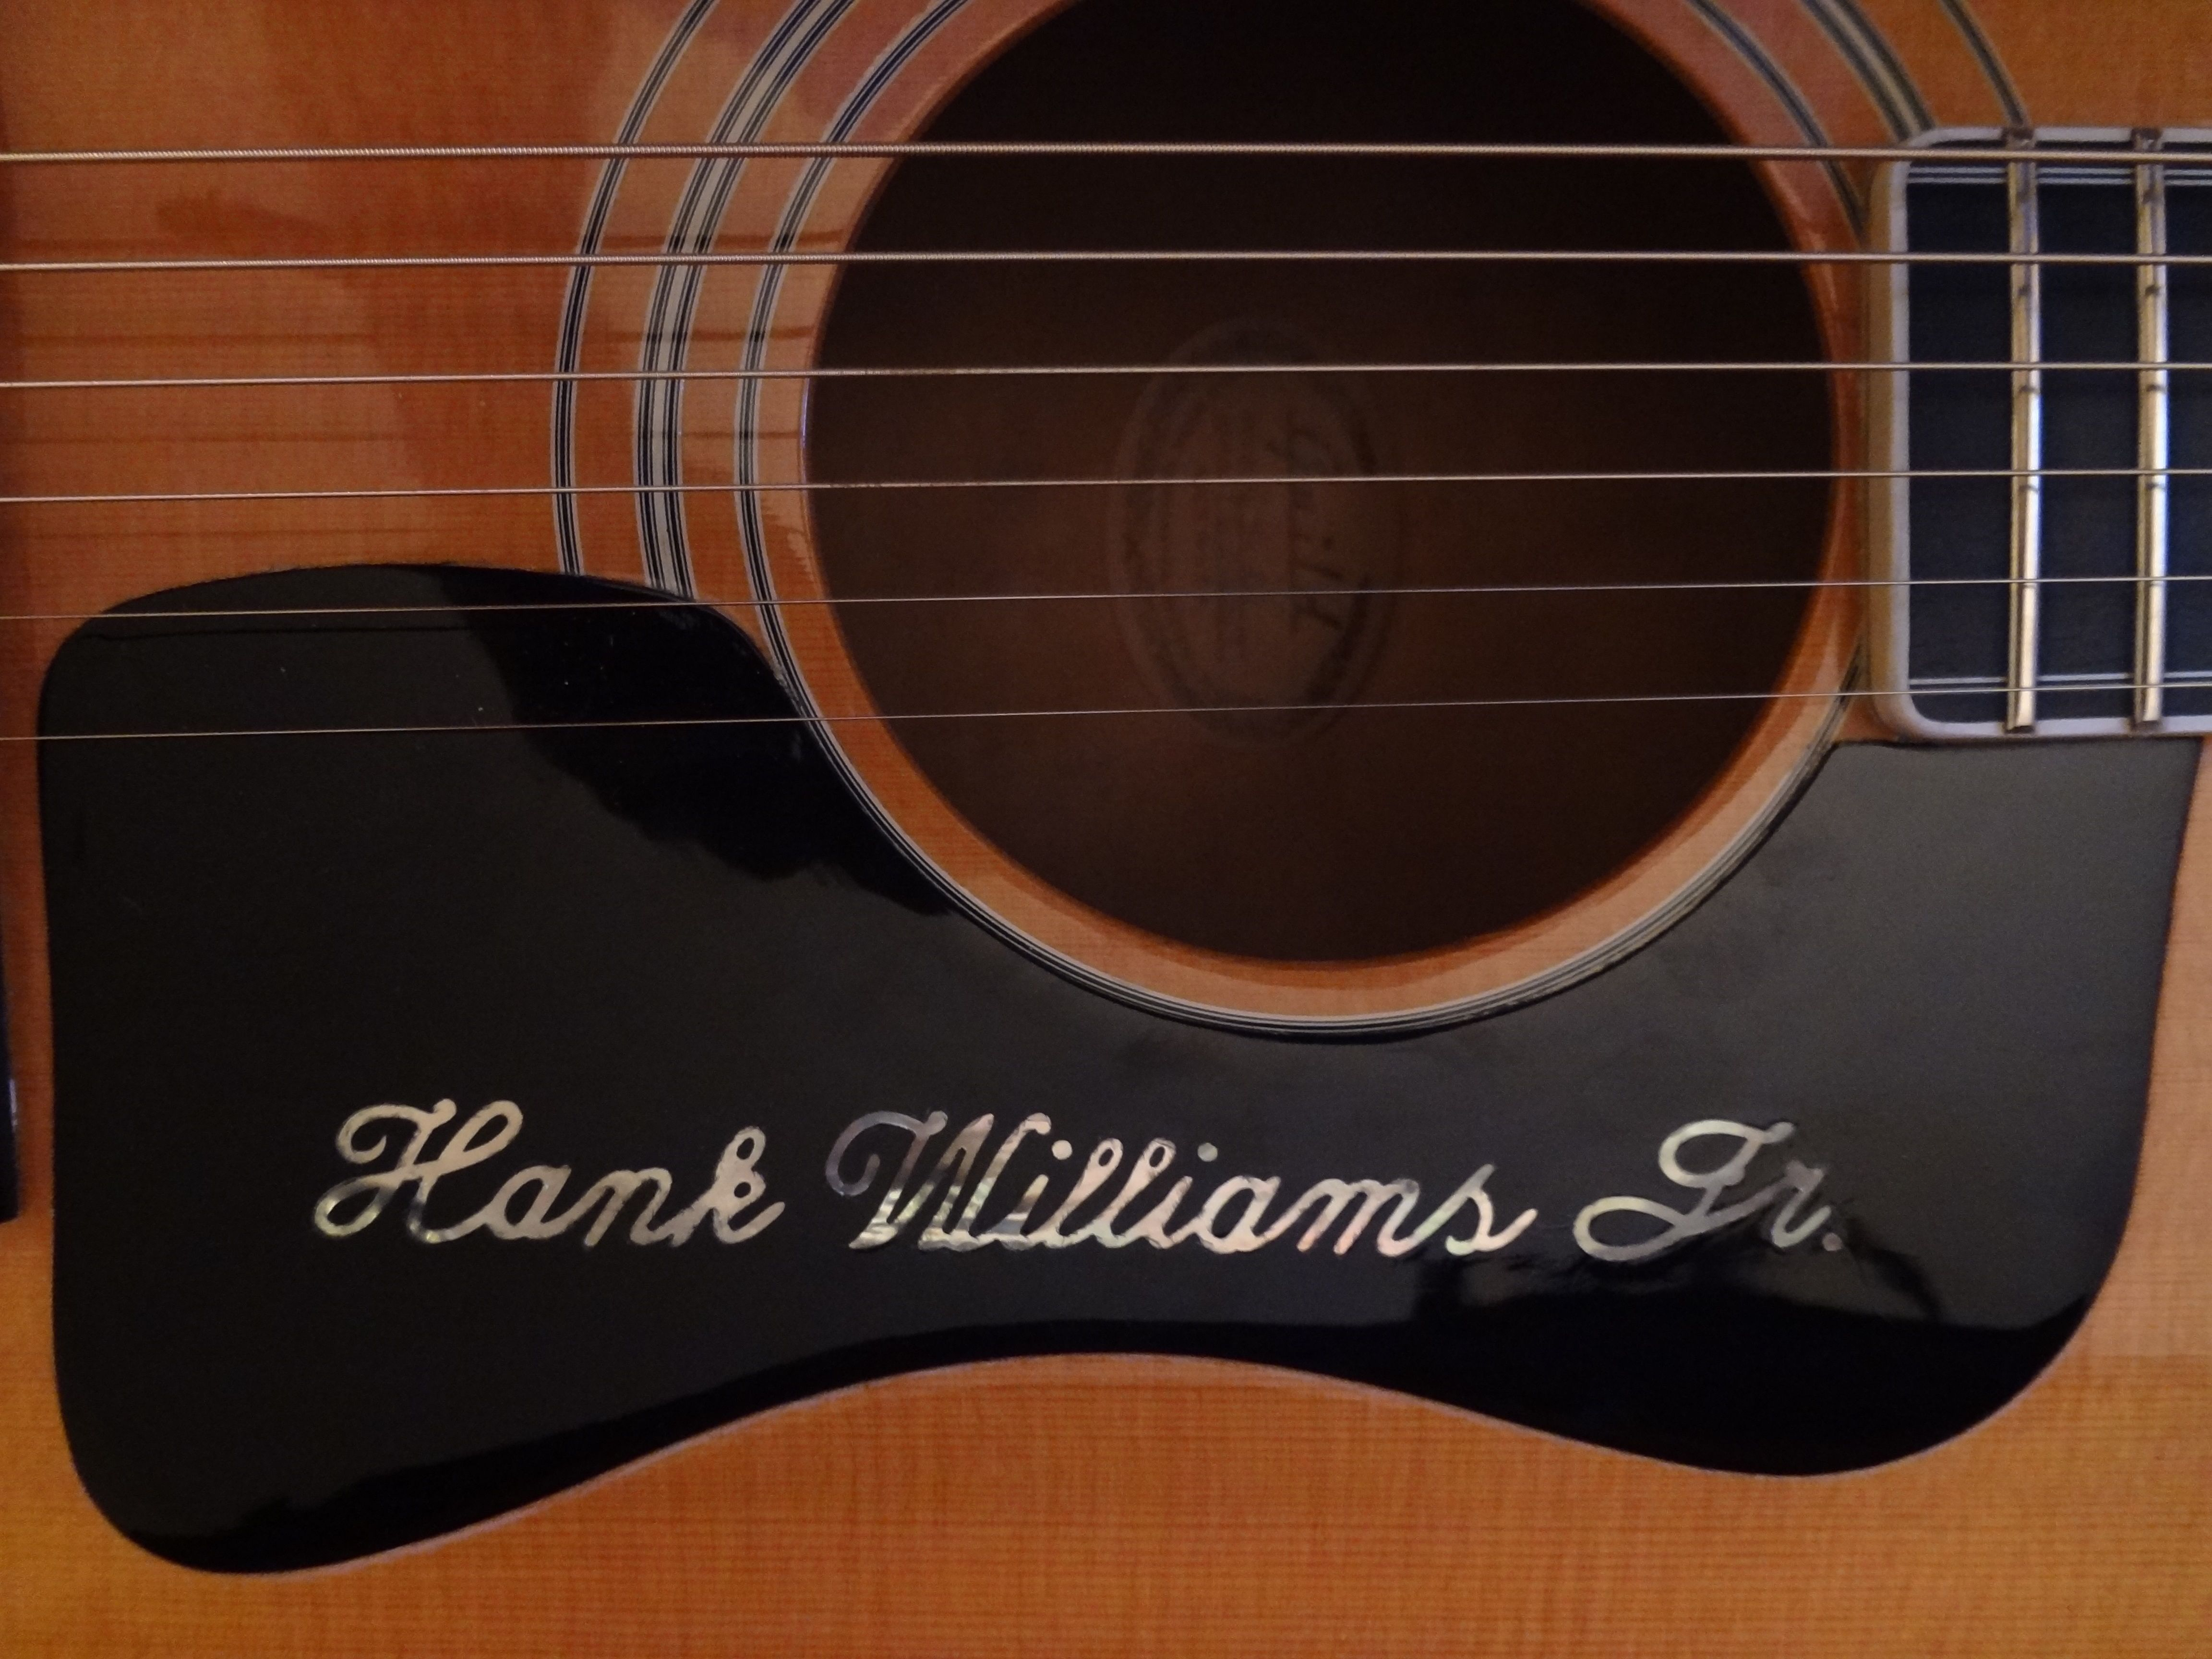 Hank williams jr essays